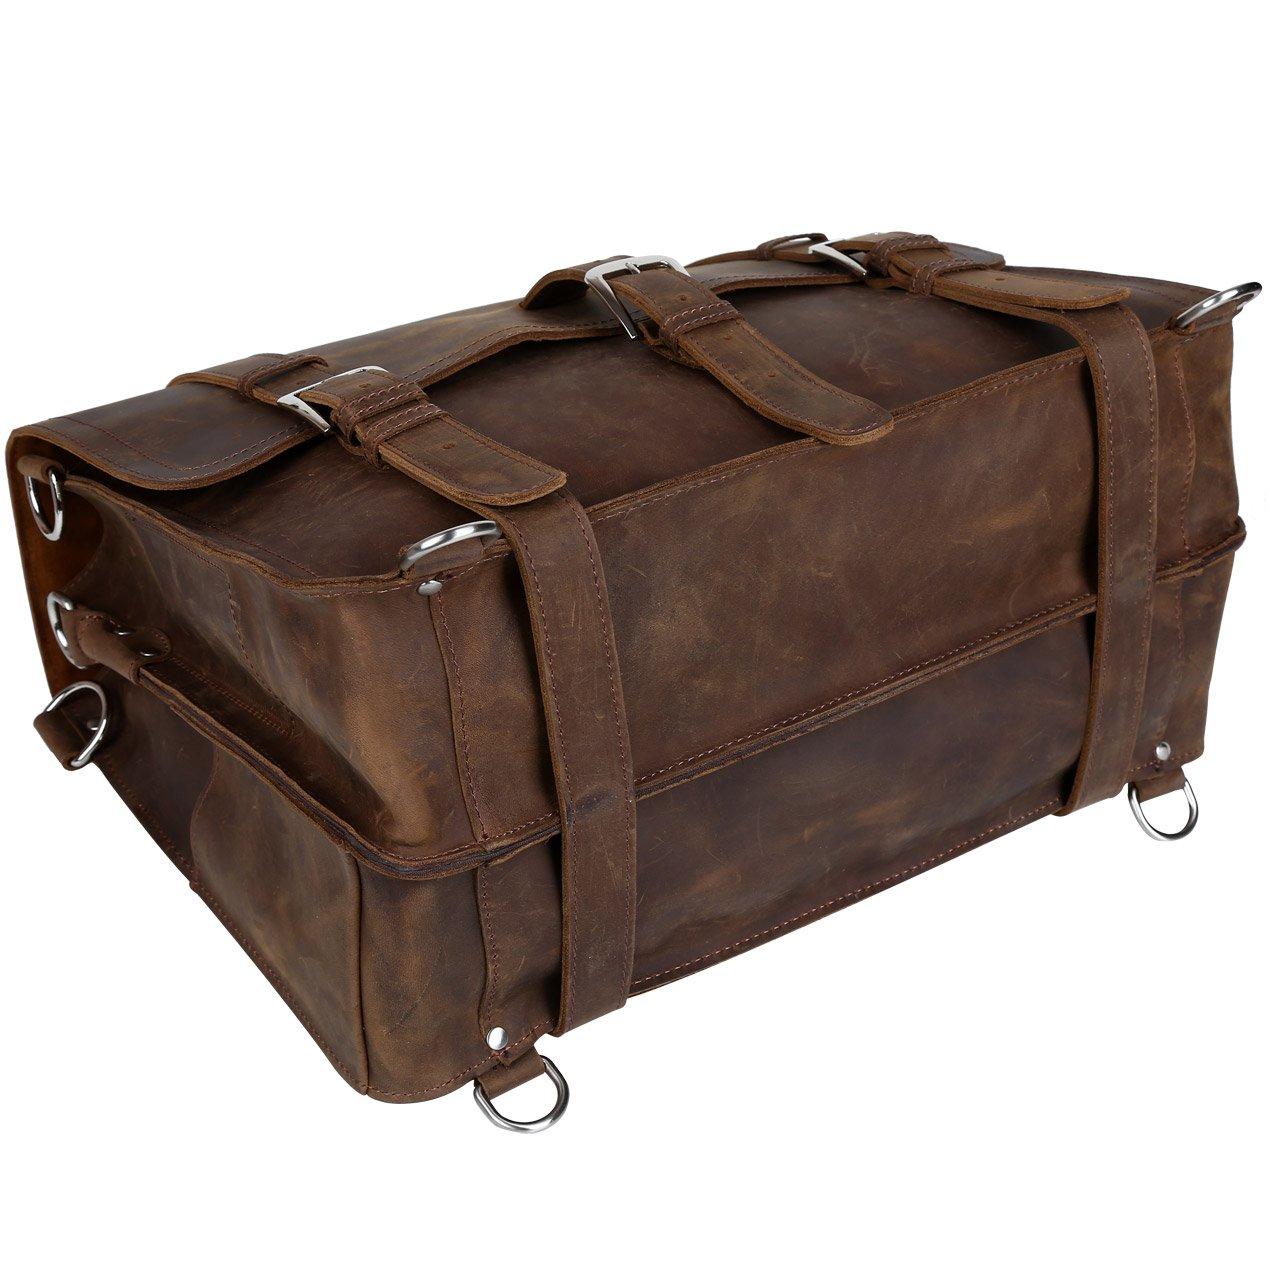 BAIGIO Vintage Leather Luggage Backpack Briefcase Travel Carryon Shoulder Bag (Dark Brown) by BAIGIO (Image #7)